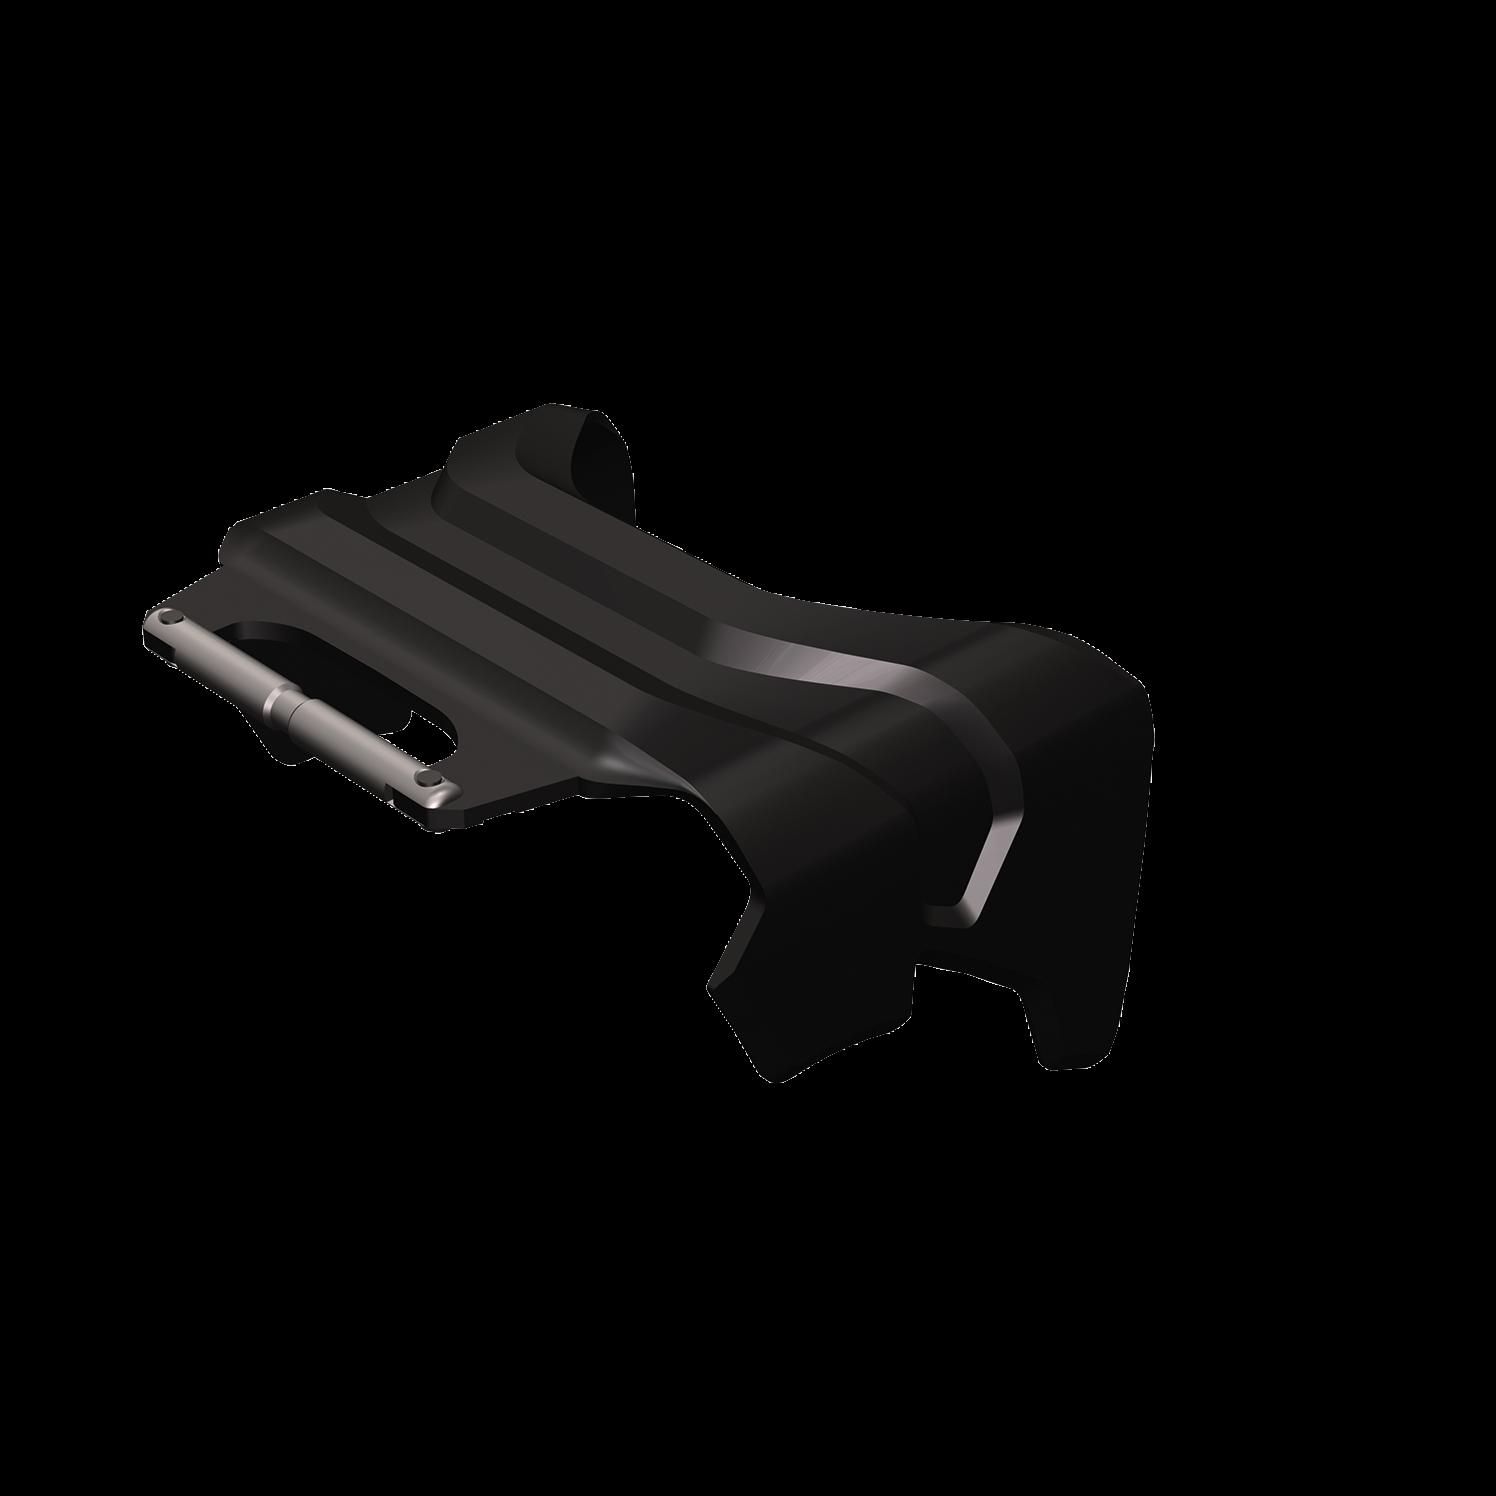 Marker Kingpin Crampon 90mm